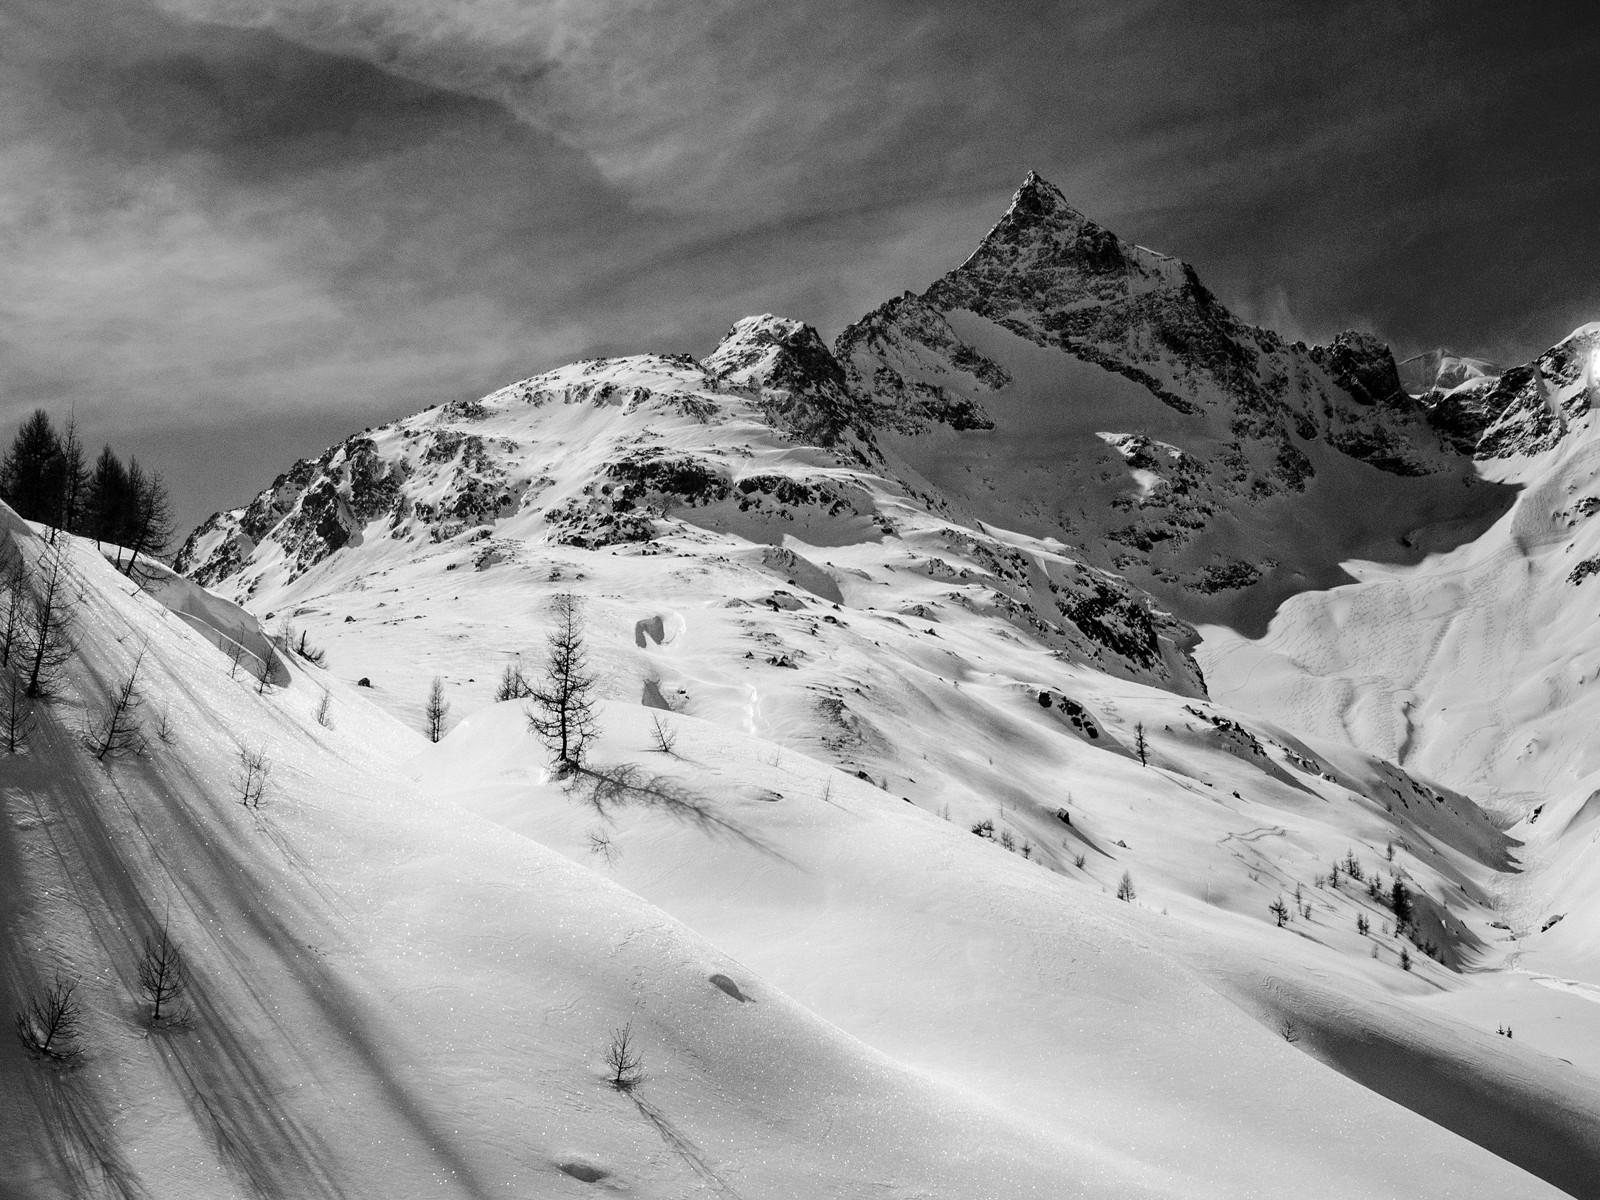 MONO - Bernina Alps by Russel Birch (9 marks)